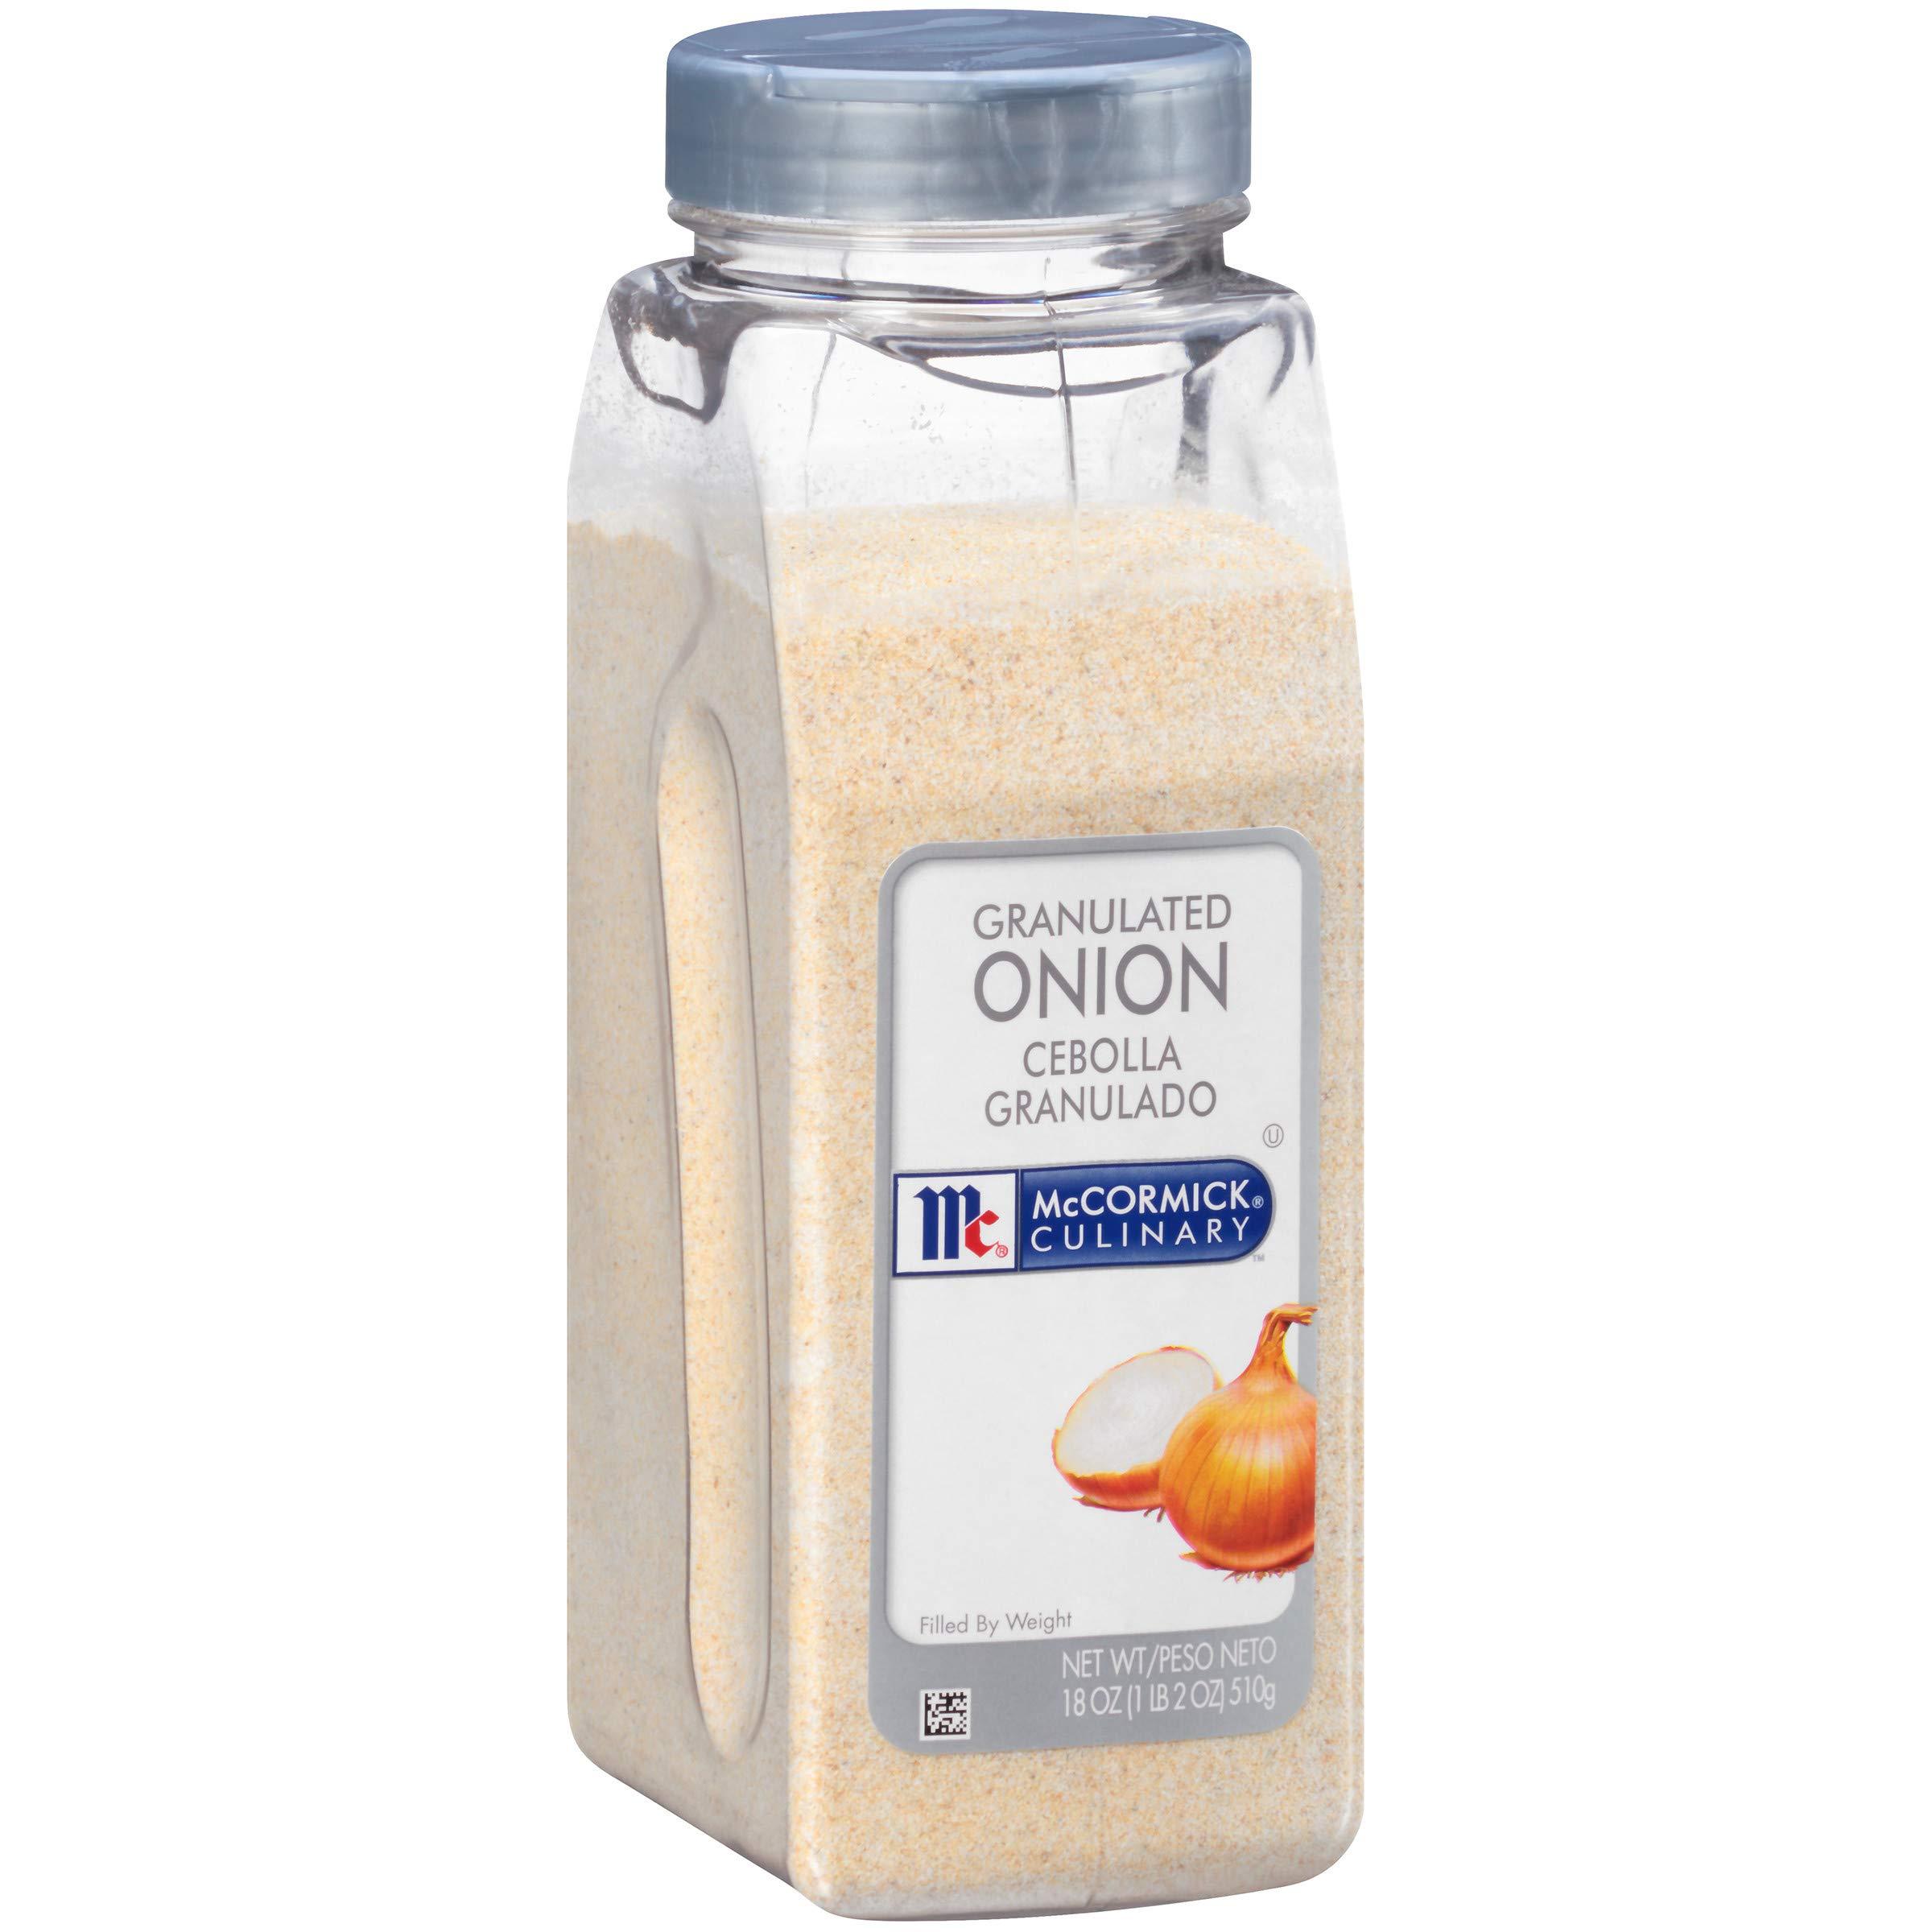 McCormick Culinary Granulated Onion, 18 oz